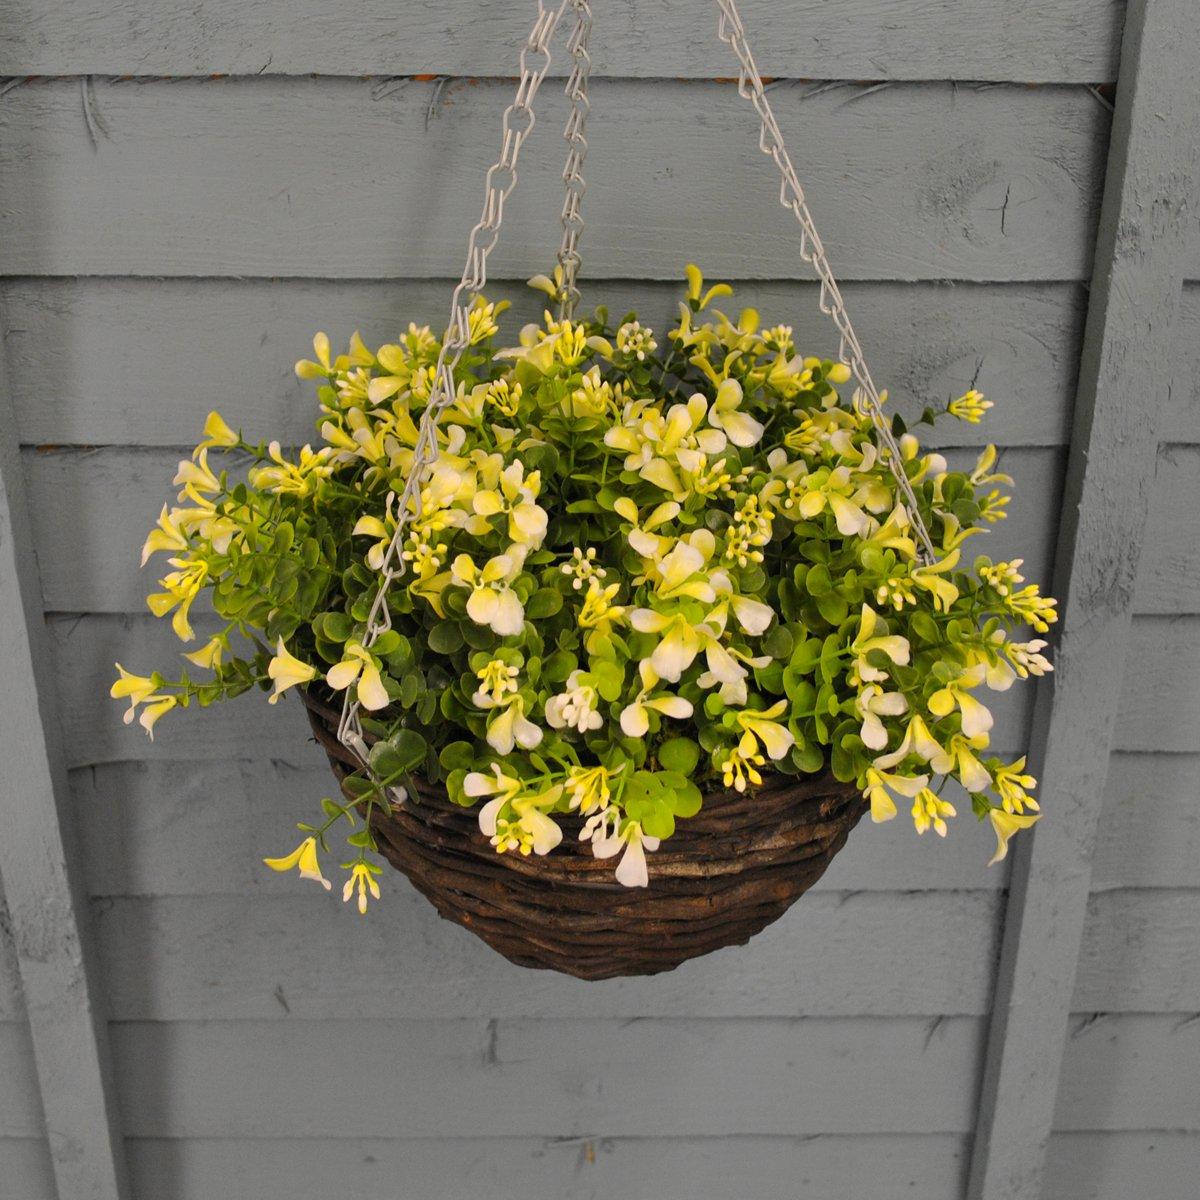 Artificial Blond Lobelia hanging basket (25 centimeters) by Smart Garden